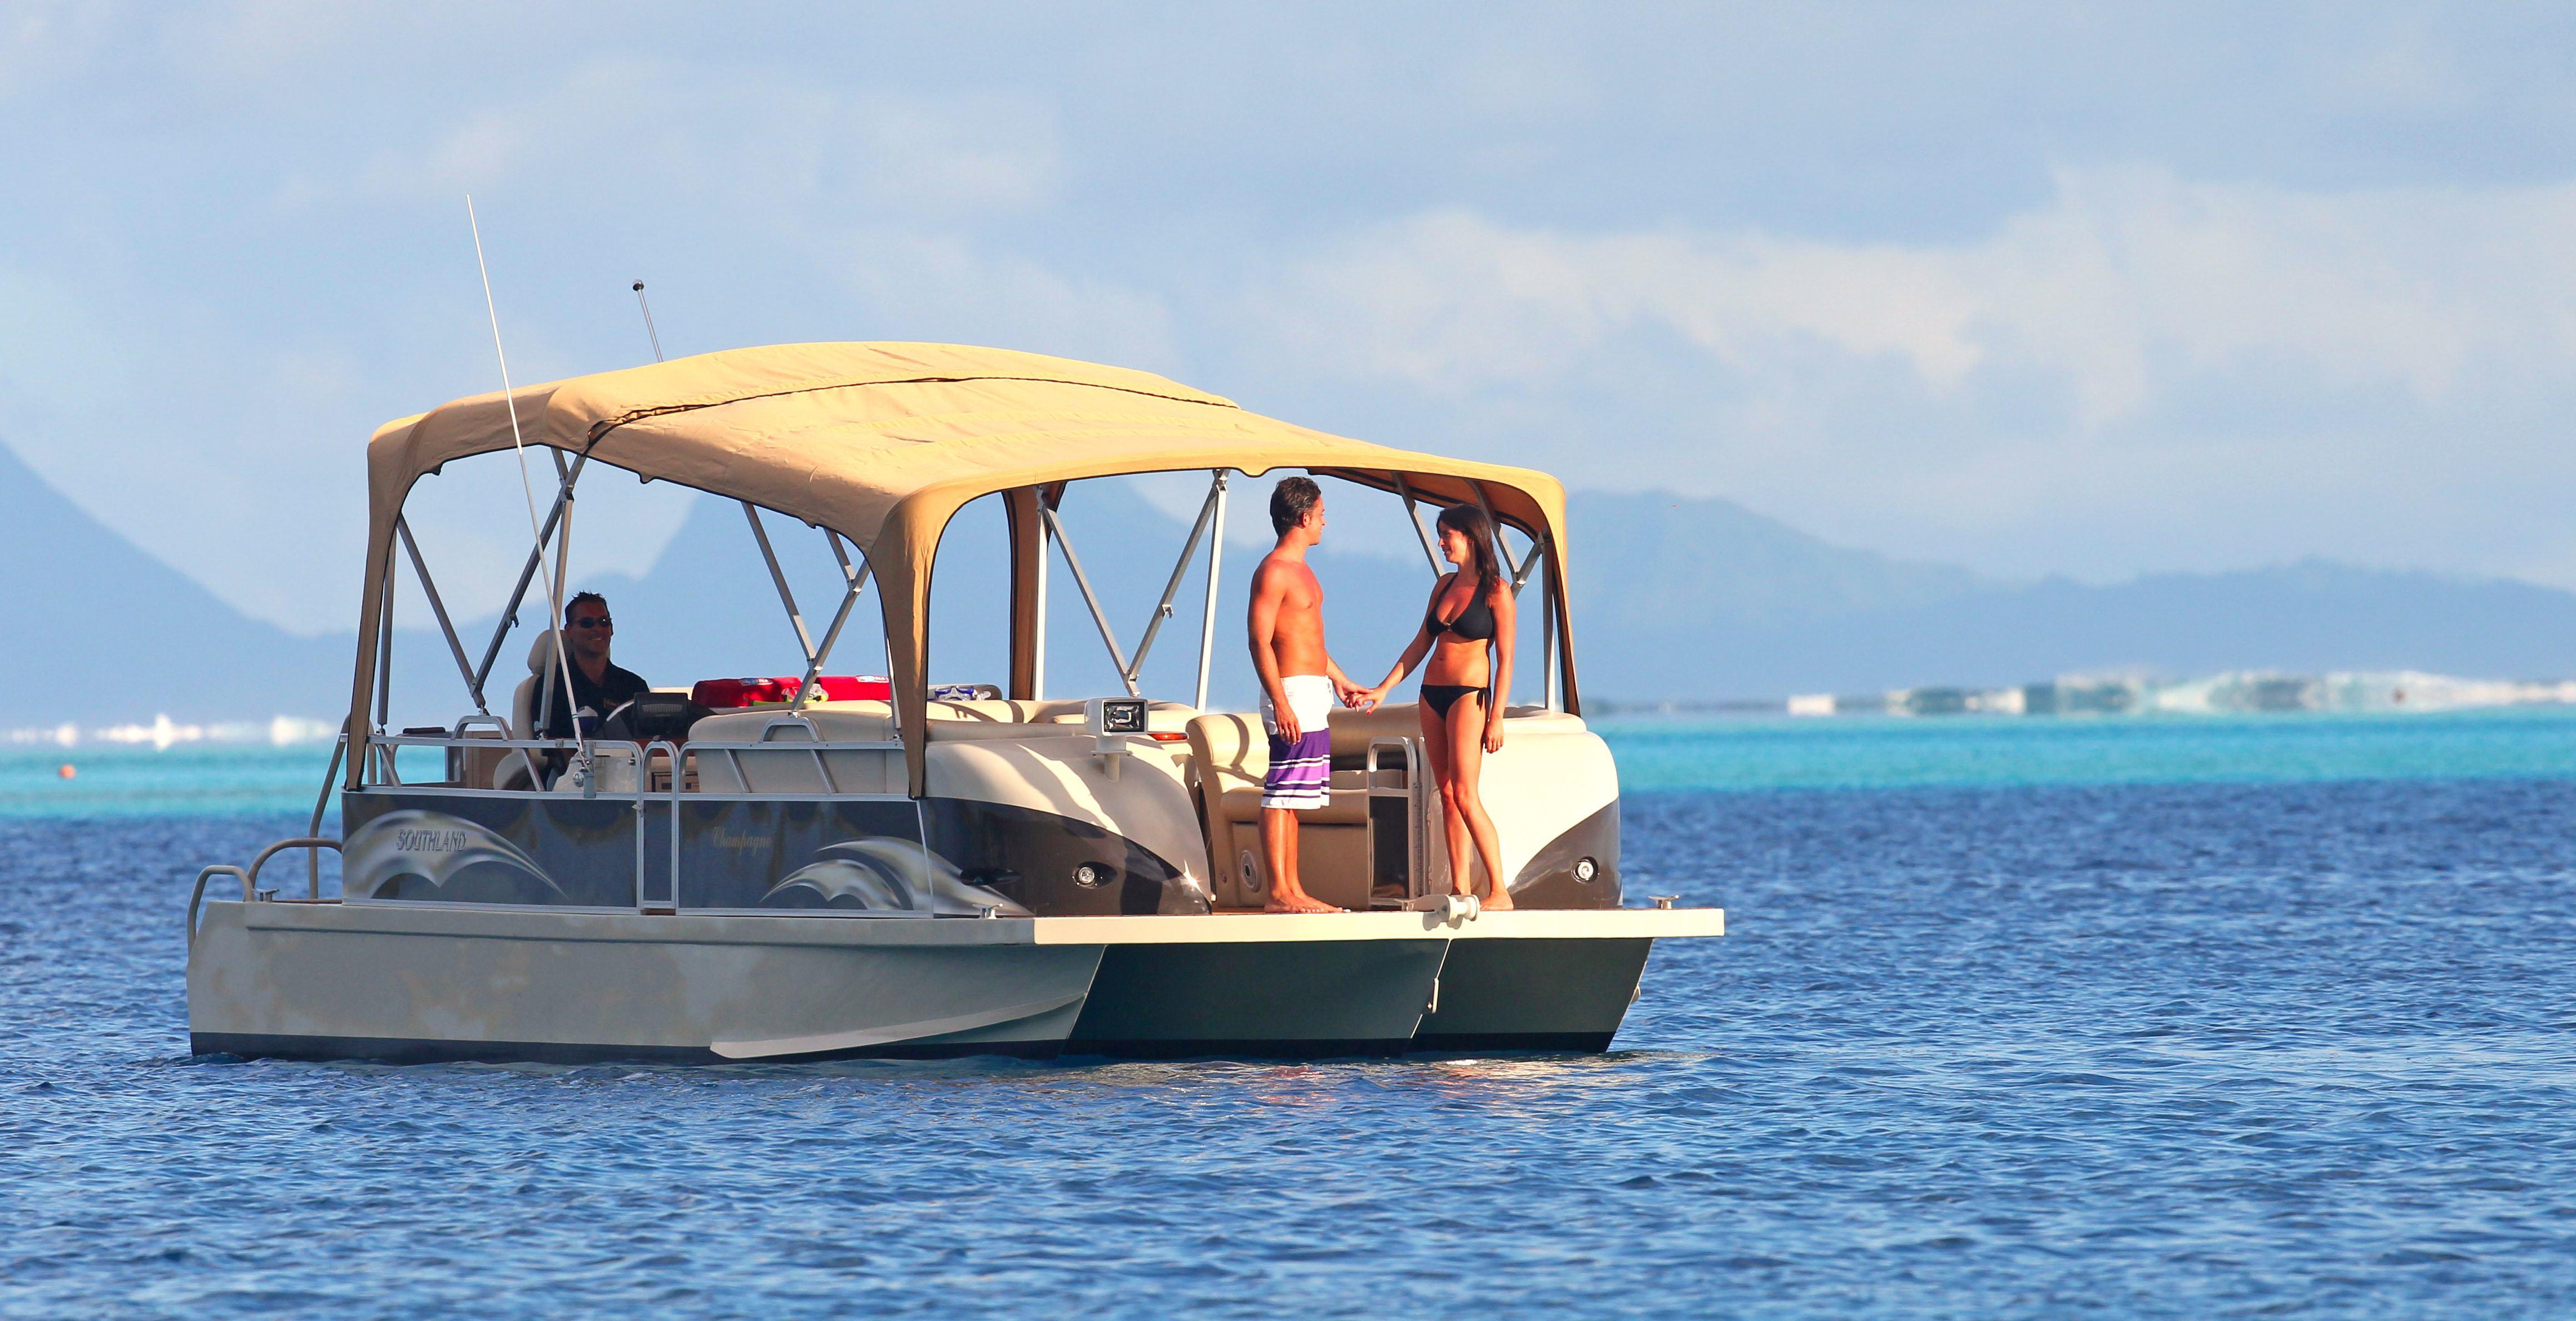 https://tahititourisme.com/wp-content/uploads/2017/08/Champagne-Boat-2.jpg